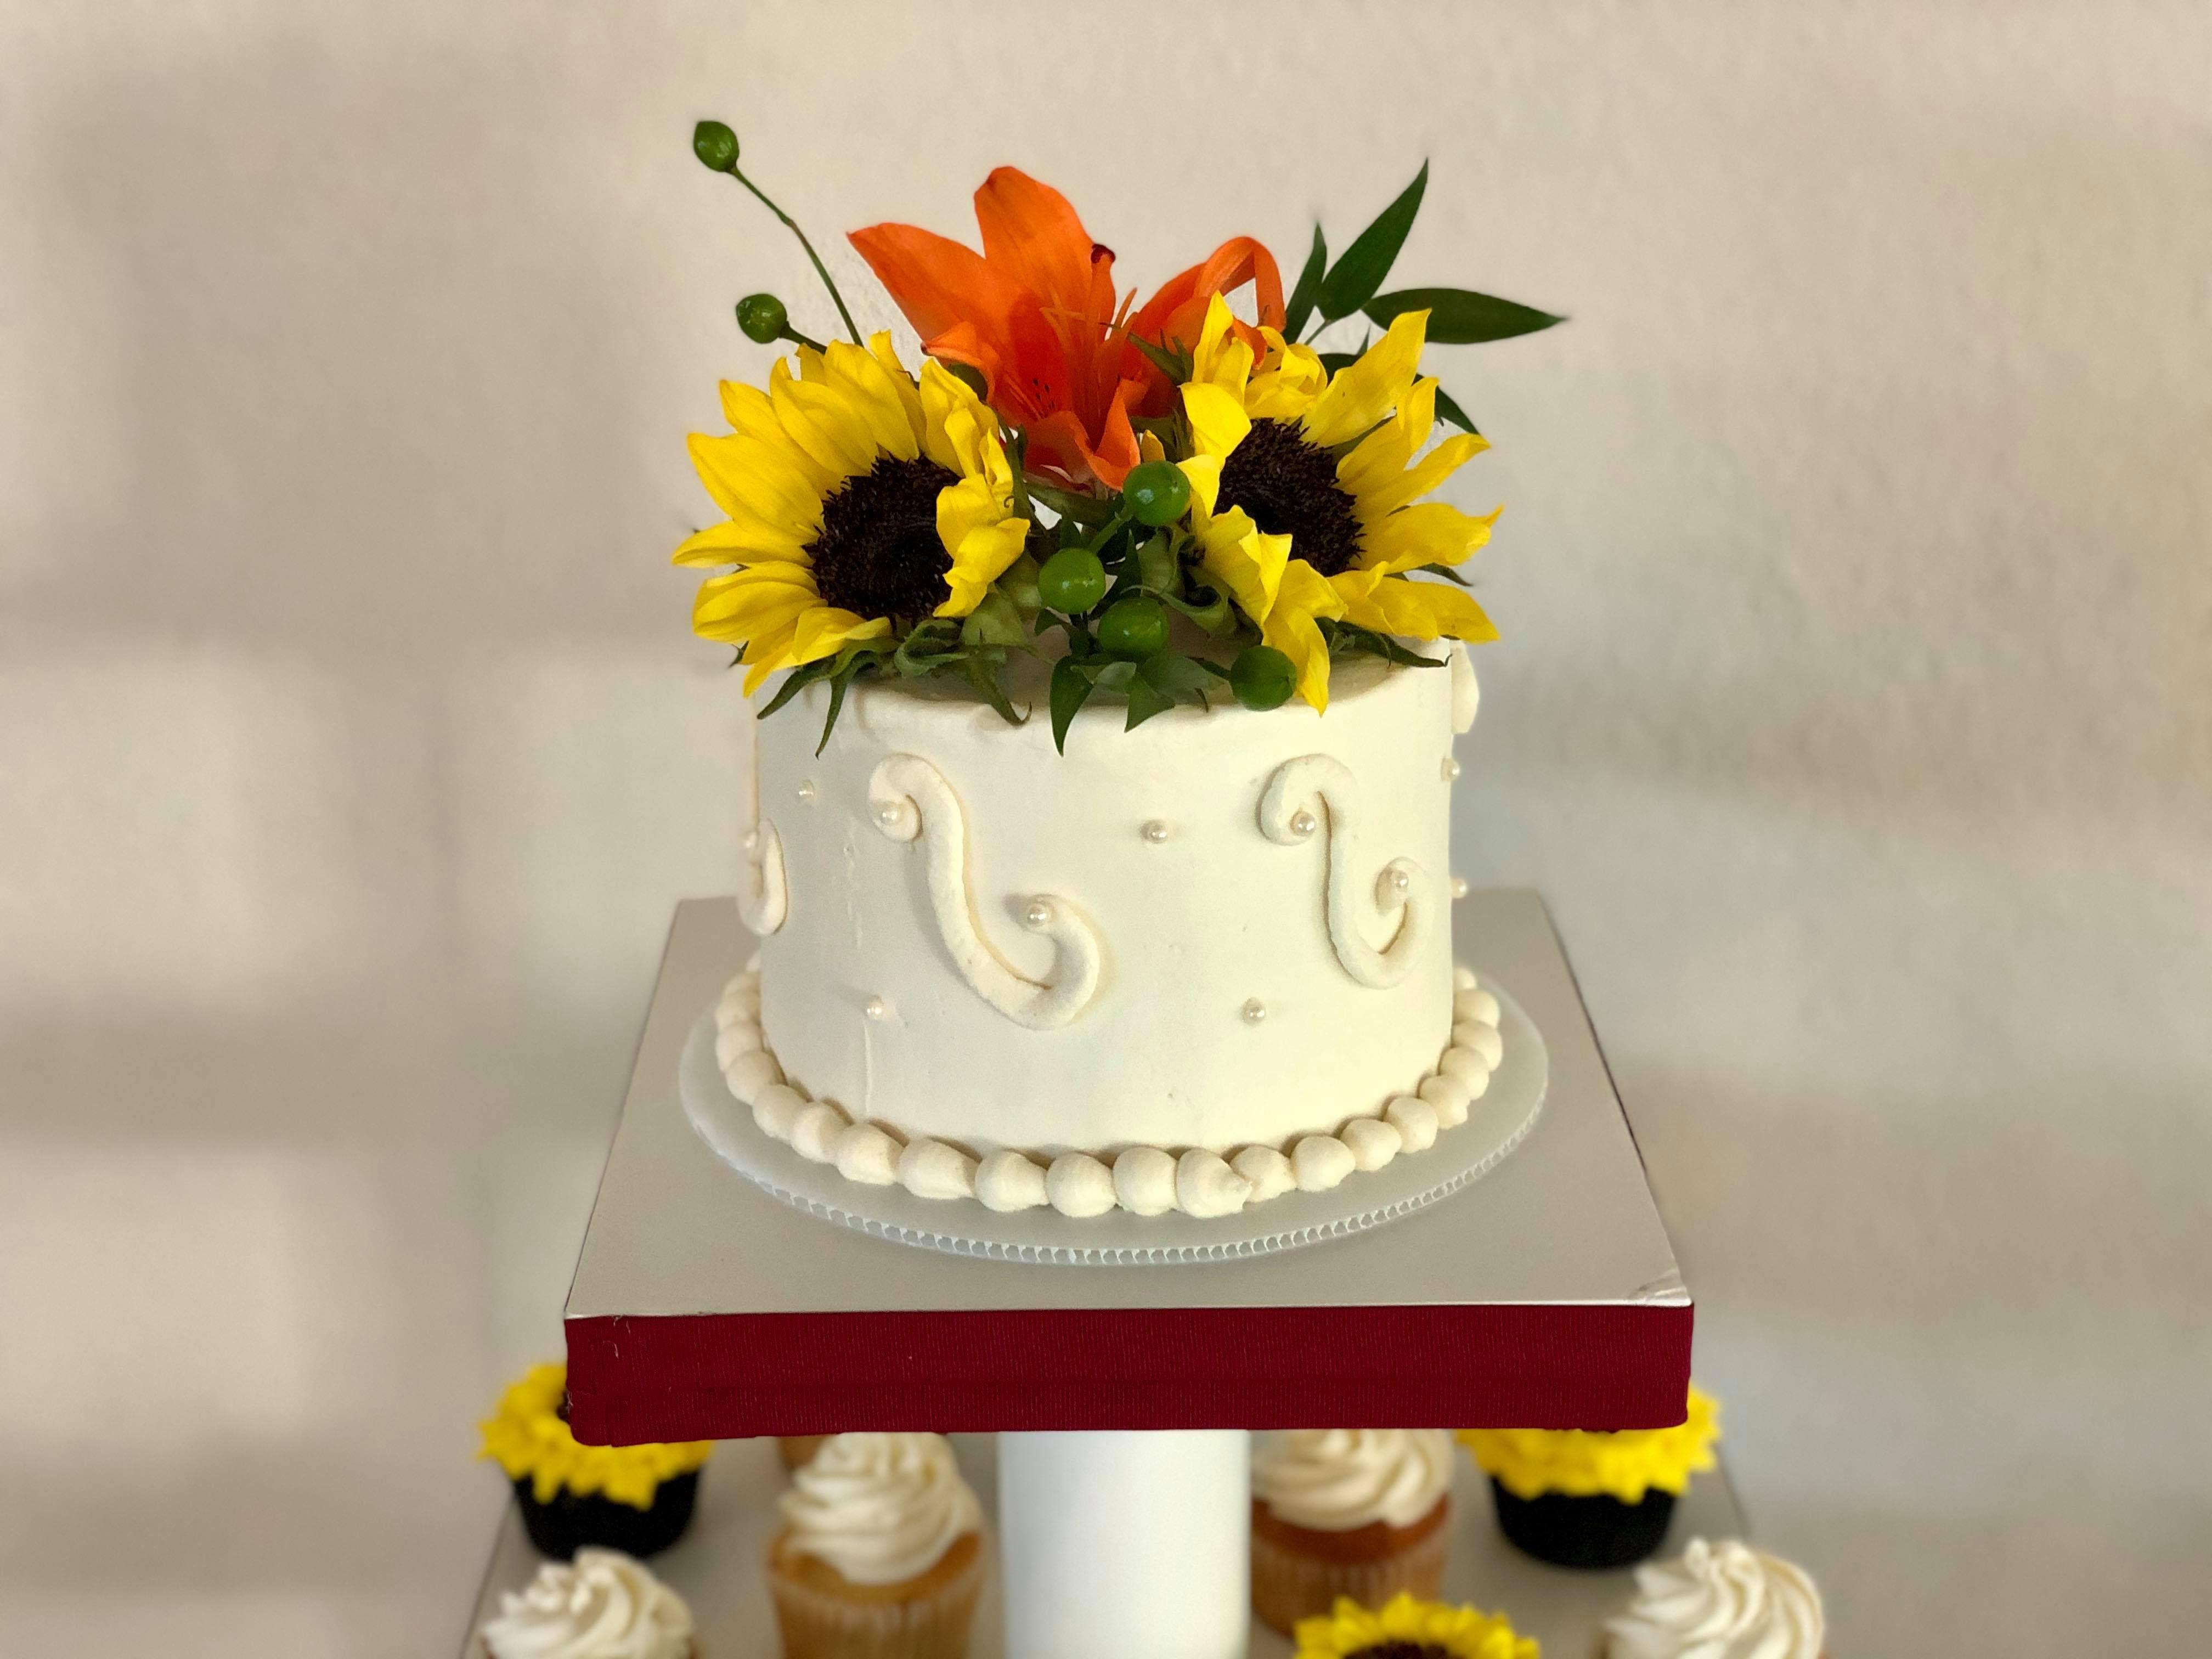 Sunflower and orange lily bridal wedding cake topper